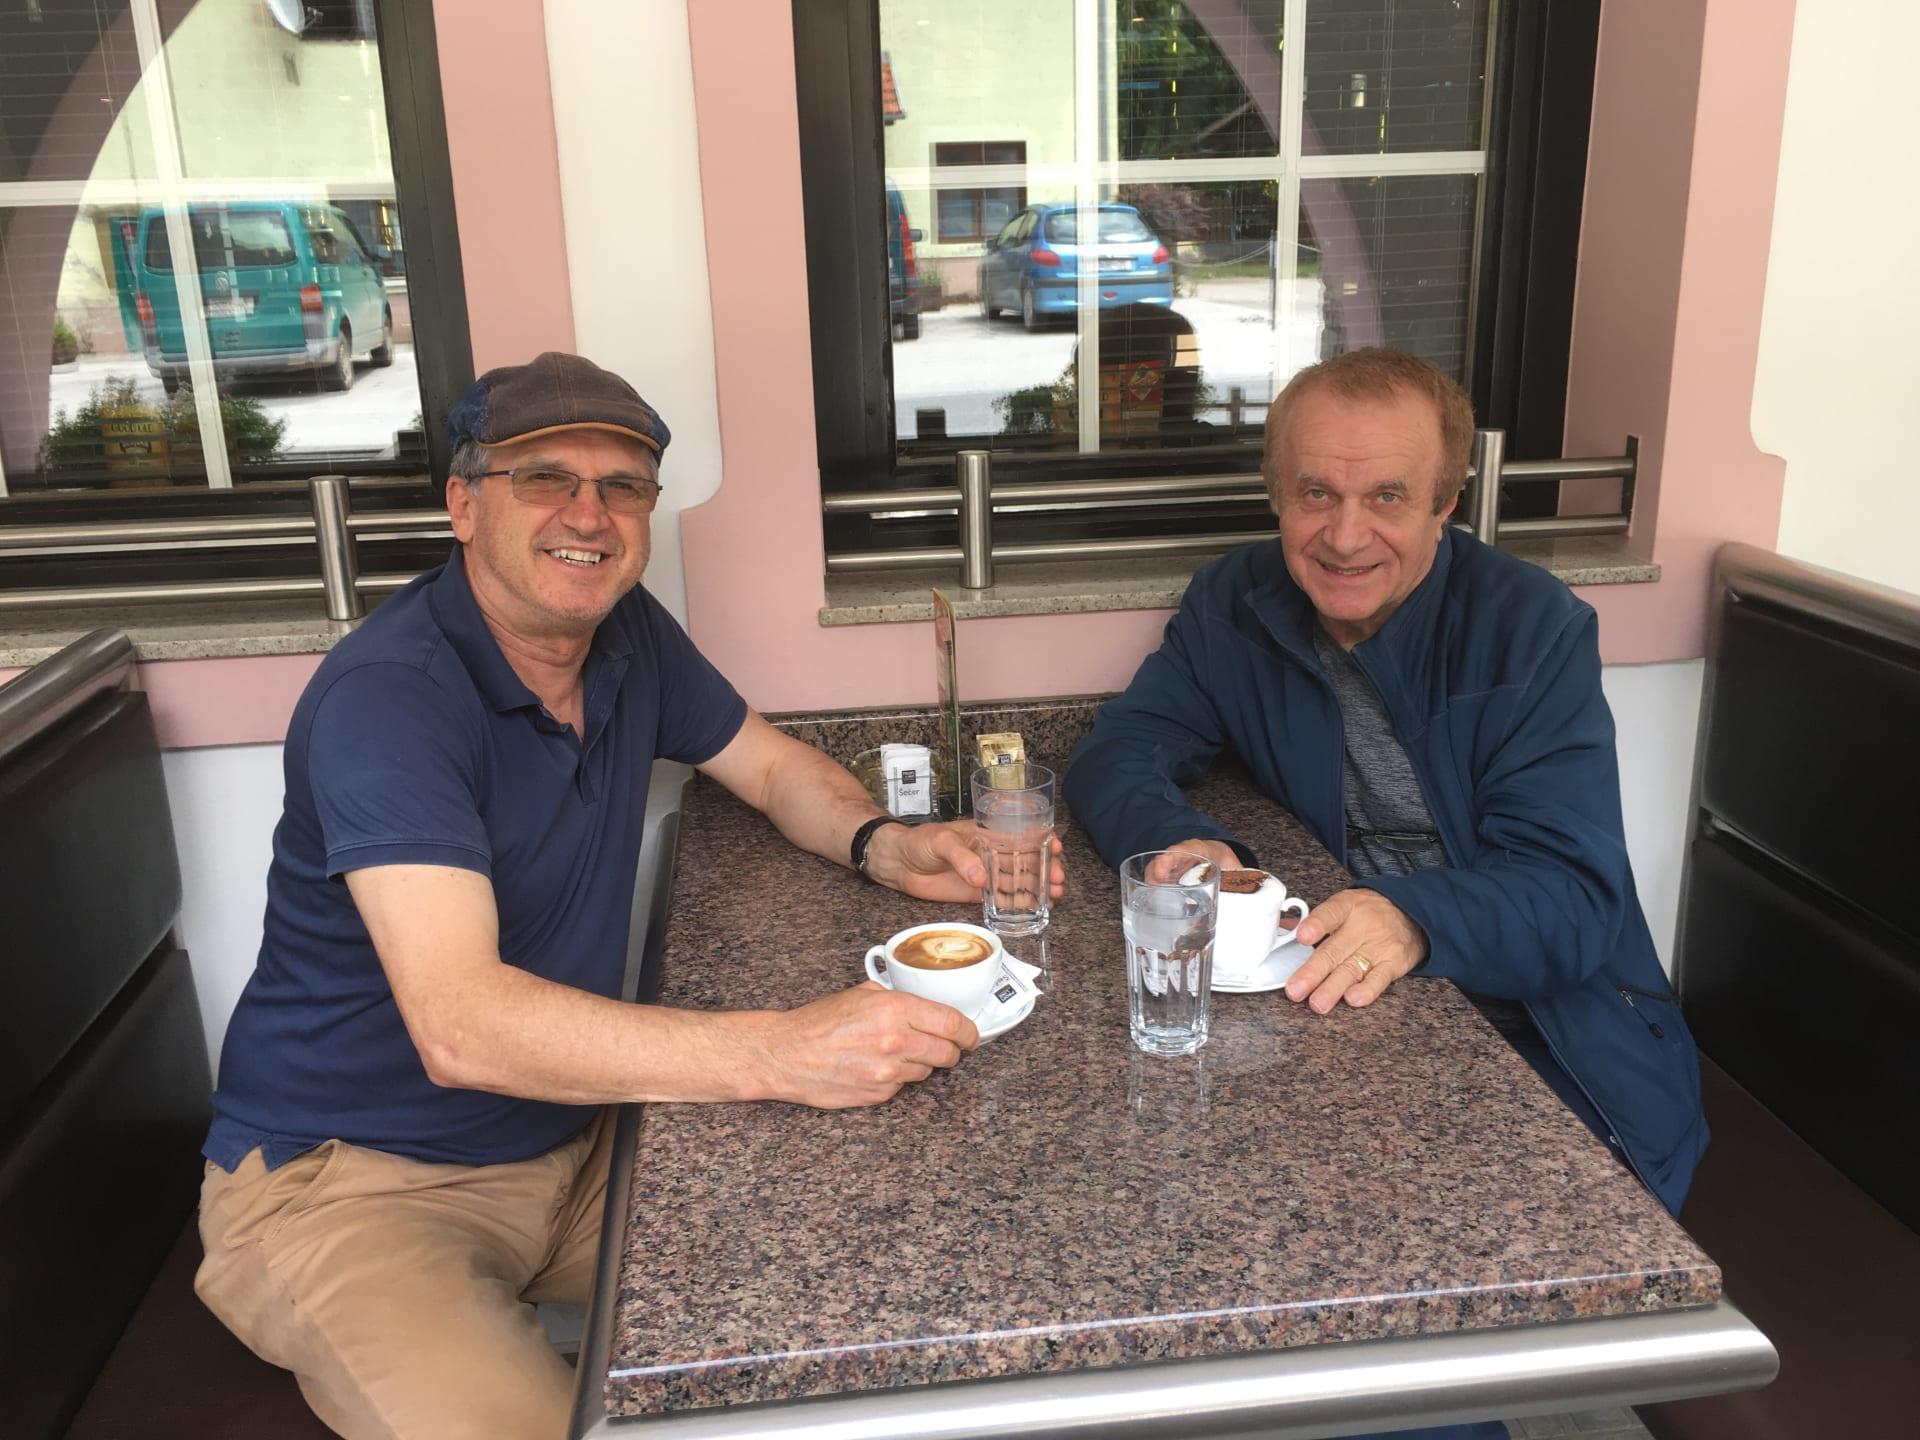 Foto: Damir Posavac (Vid Horvat s našim novinarom)